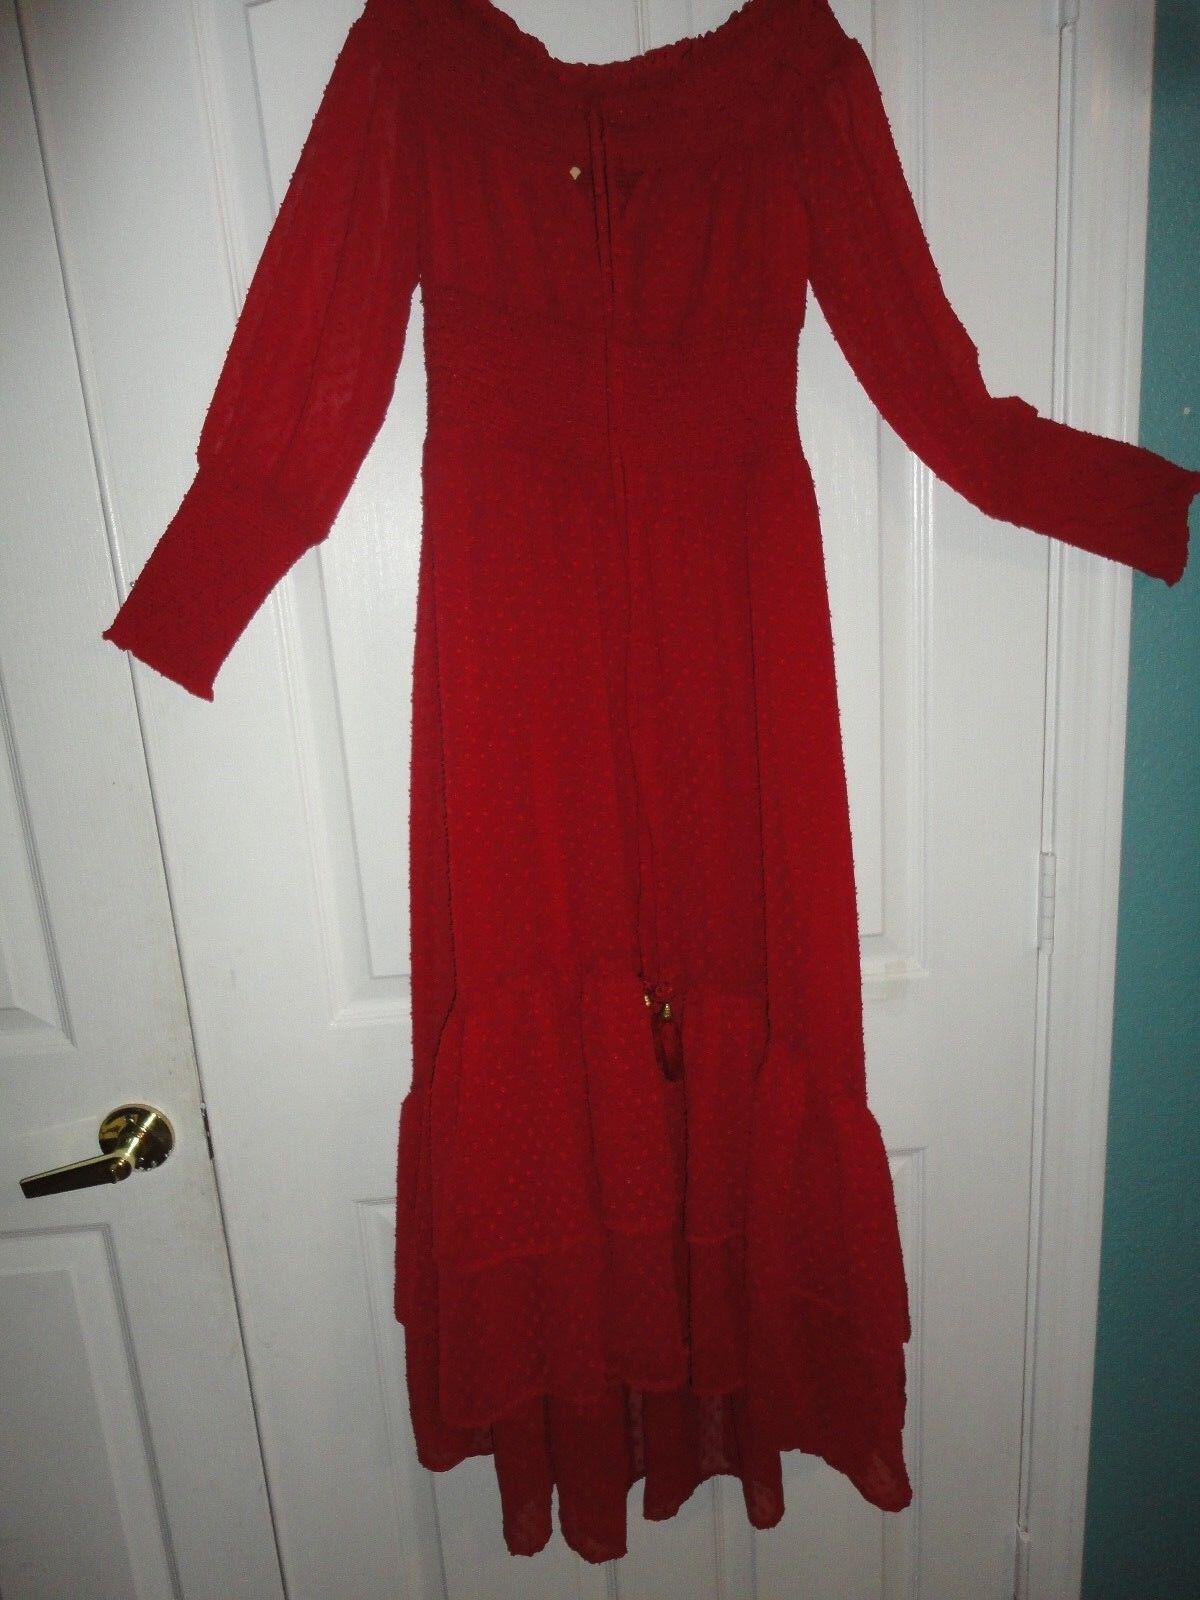 ANTHROPOLOGIE DILLARDS CHELSEA & lila MULBERRY rot SWISS DOTS Größe XS DRESS